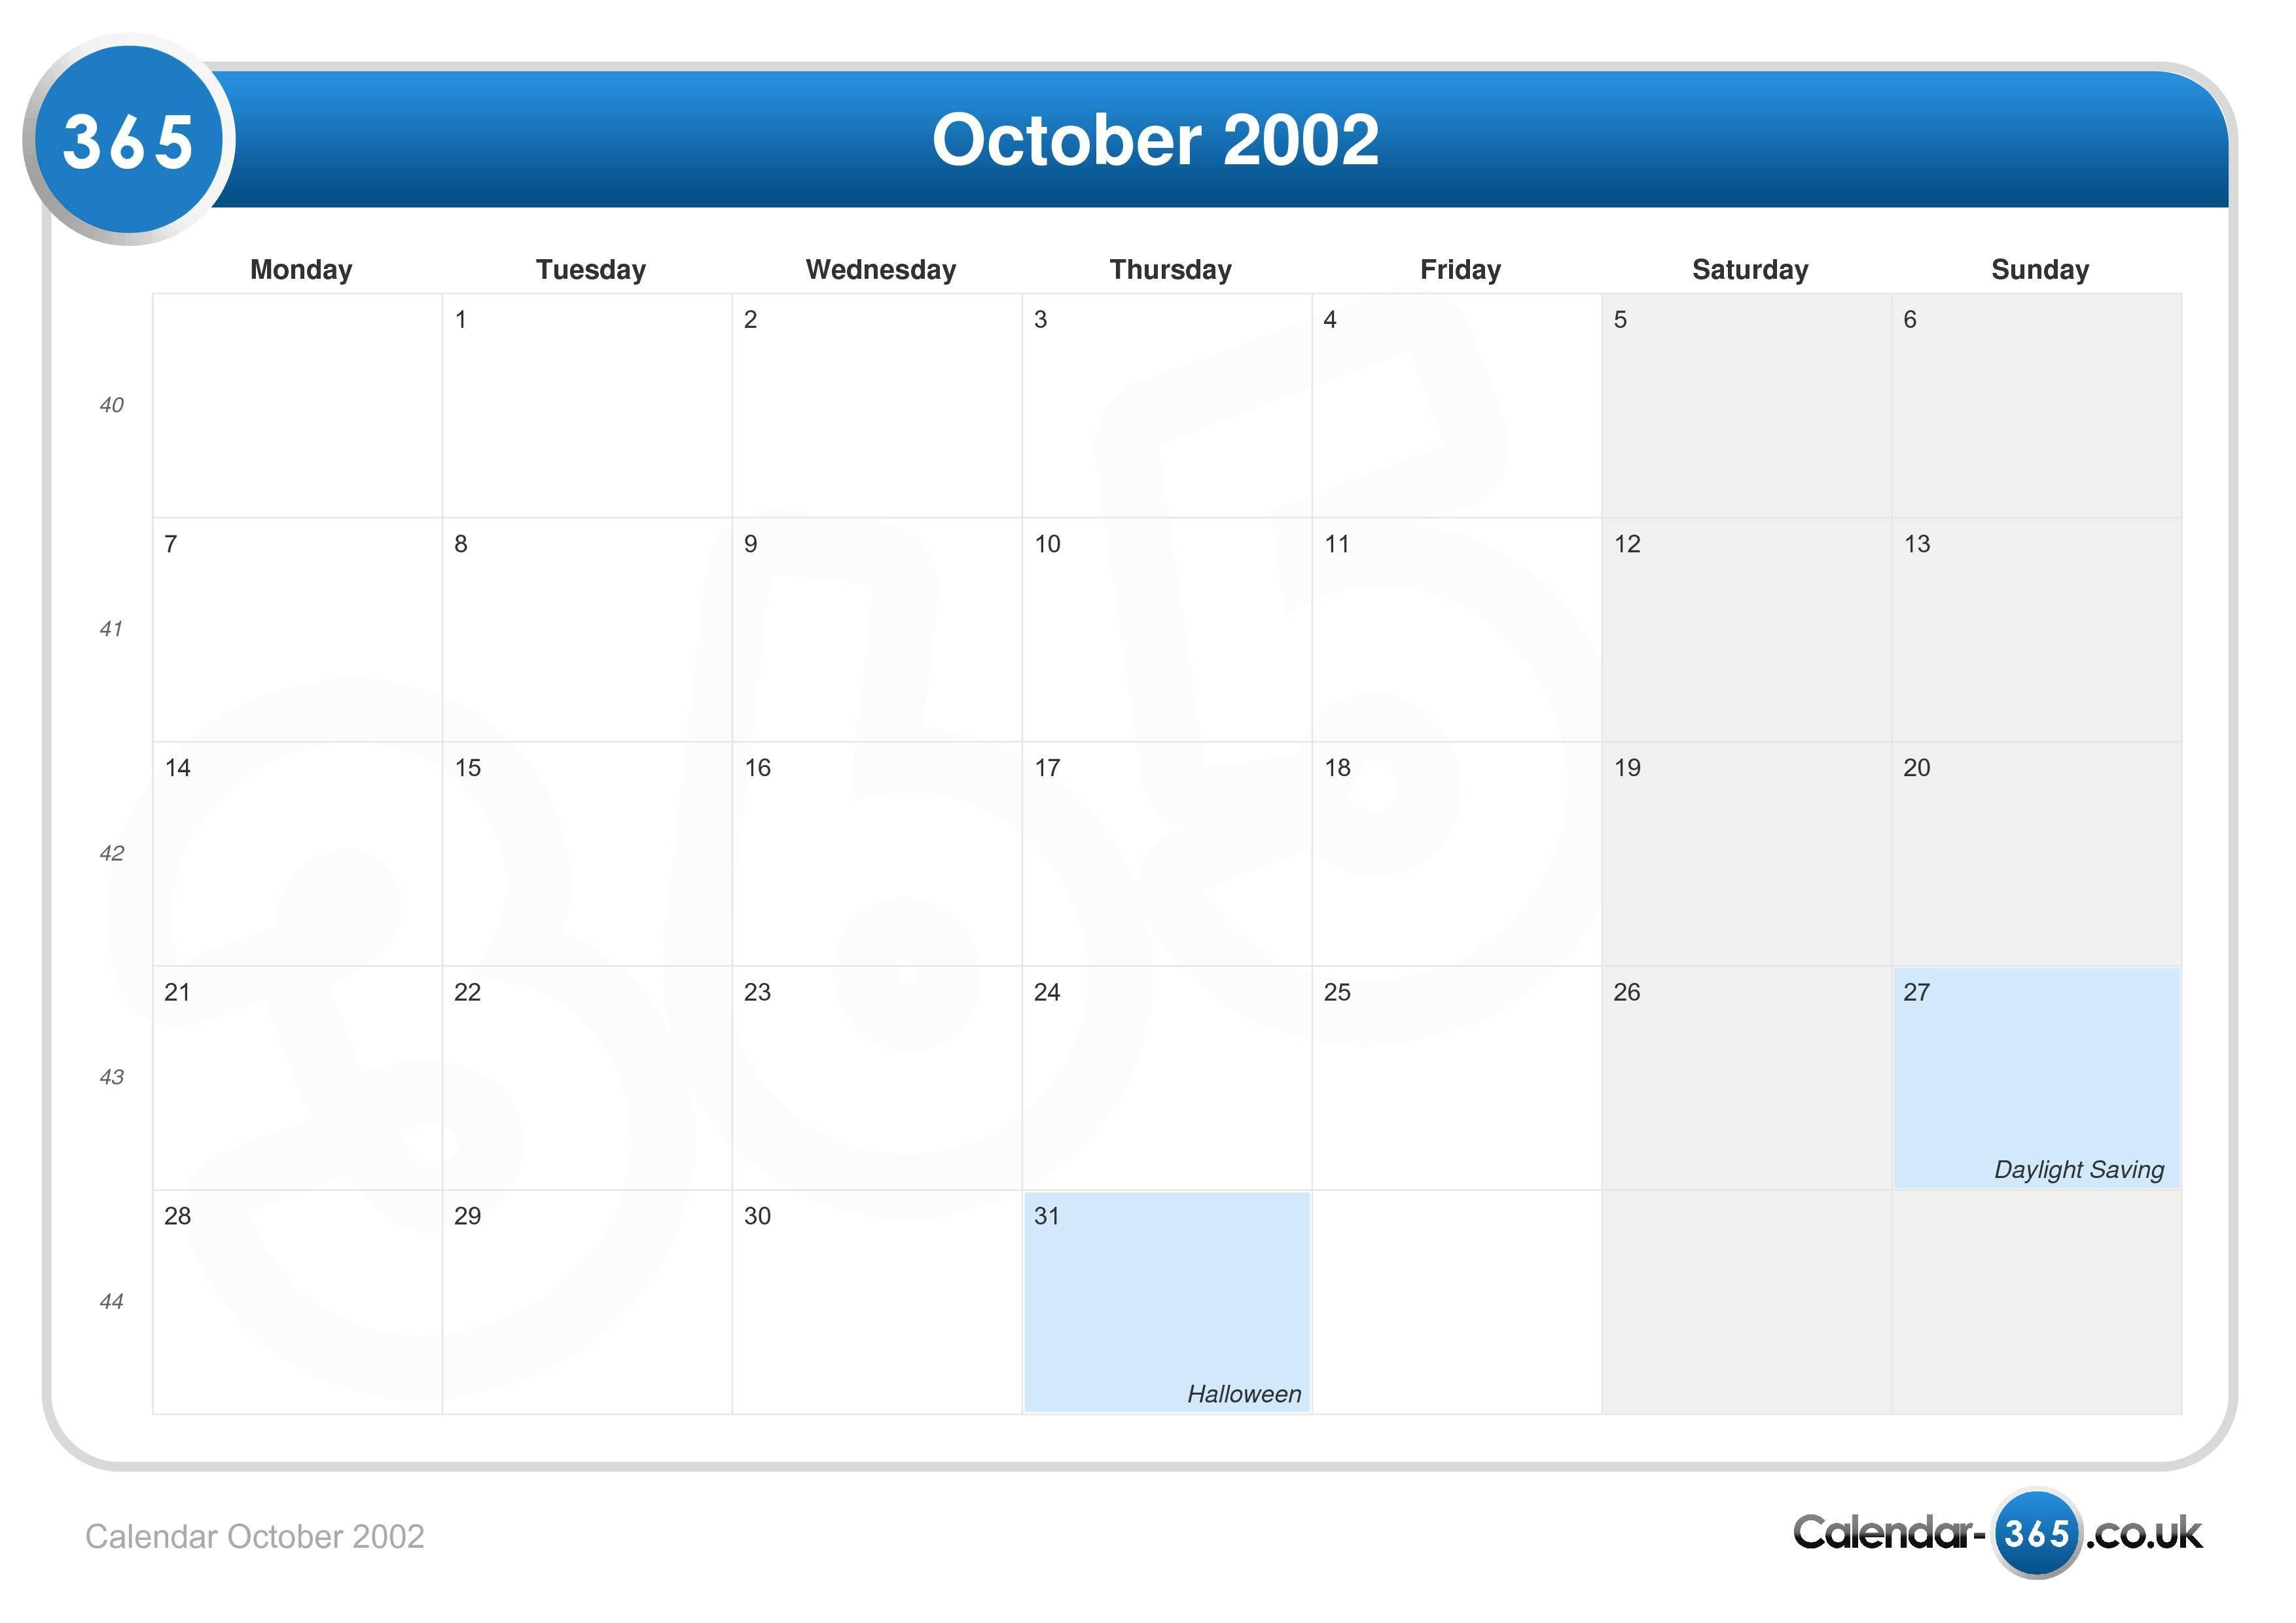 Calendar October 2002